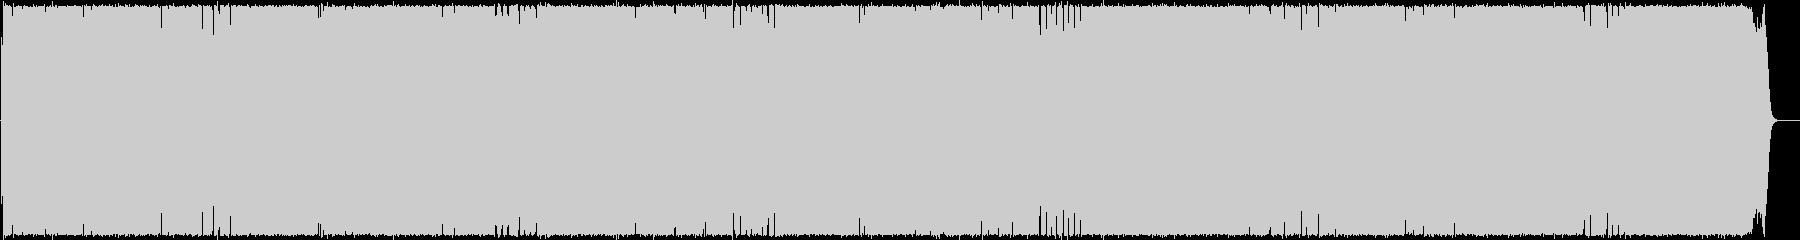 Morobi and Kozori Hard Rock's unreproduced waveform